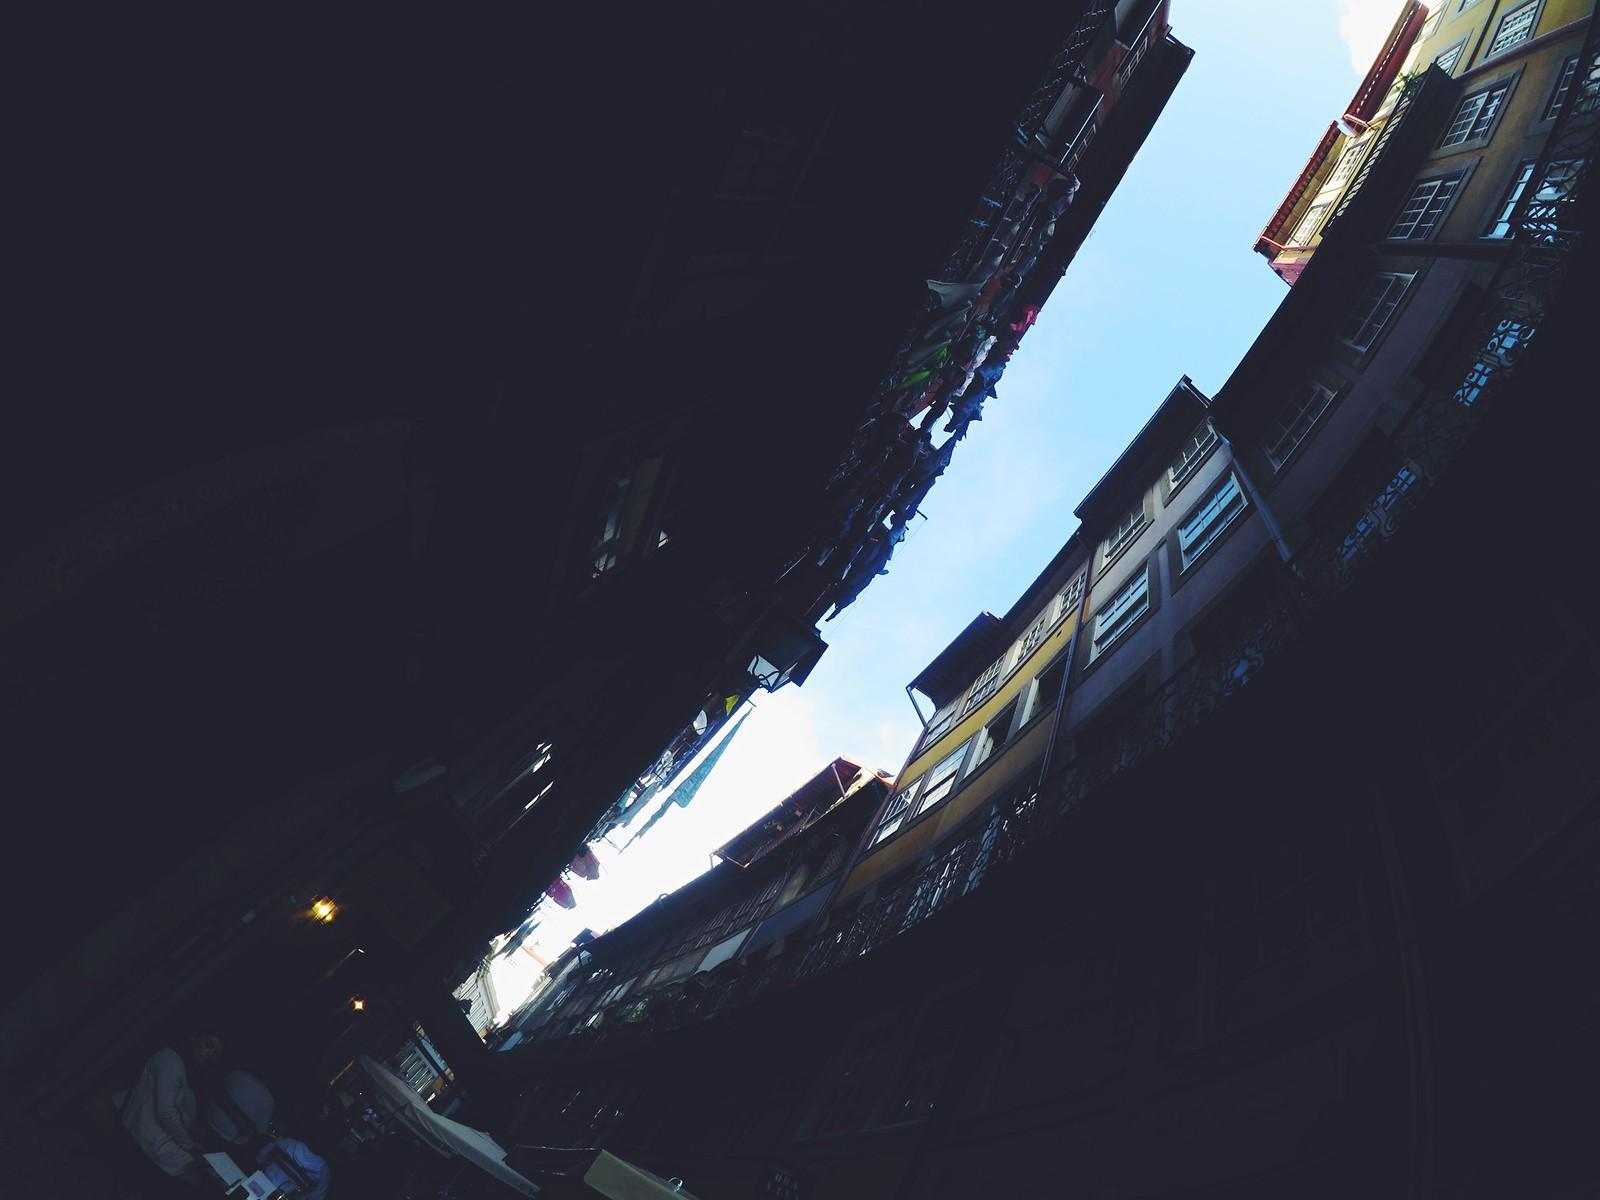 IMG_0741[1]